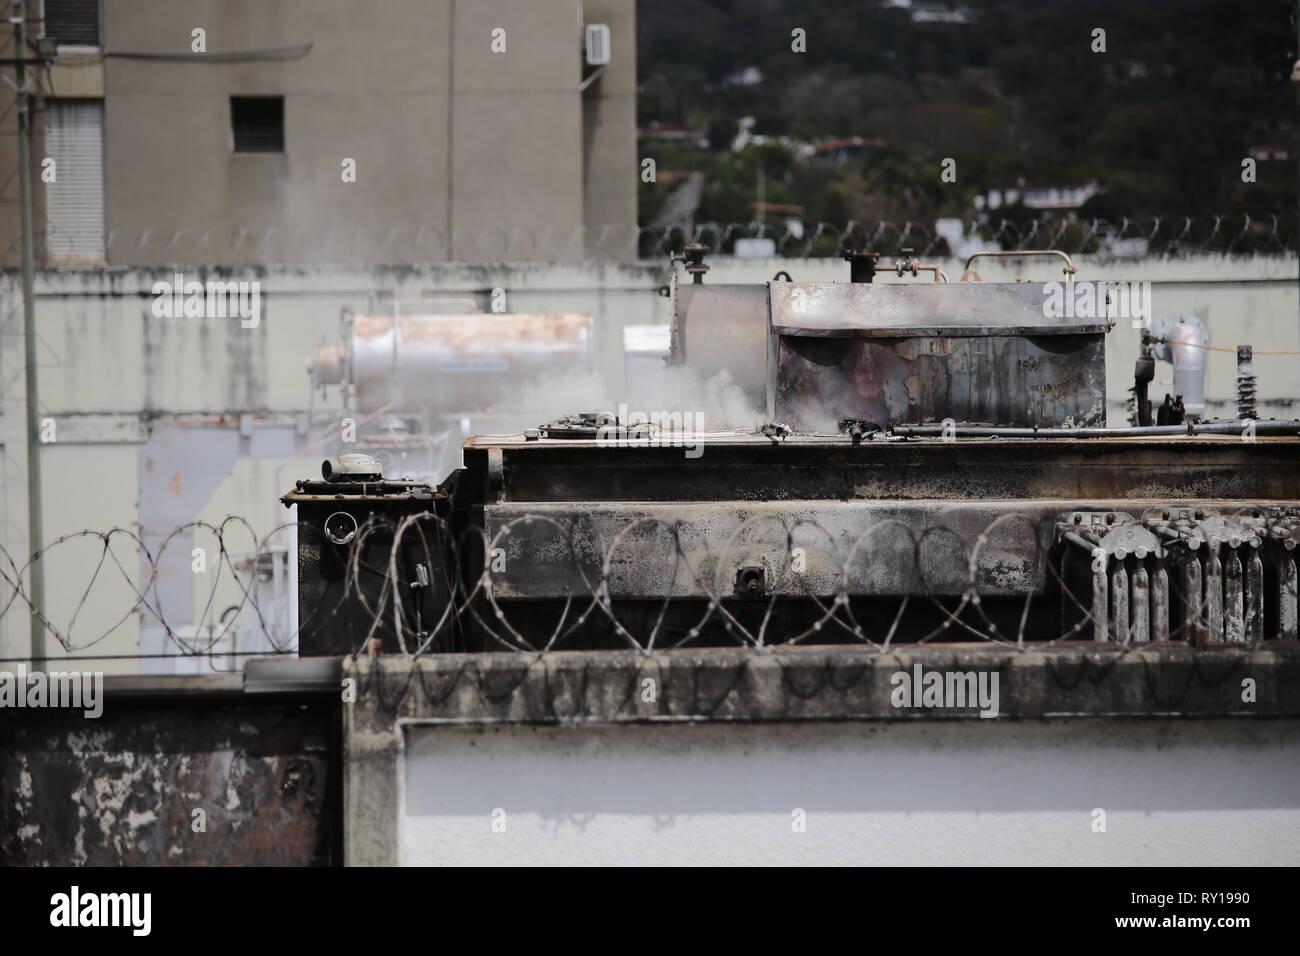 Caracas, Venezuela  11th Mar, 2019  Smoke rises from the power plant